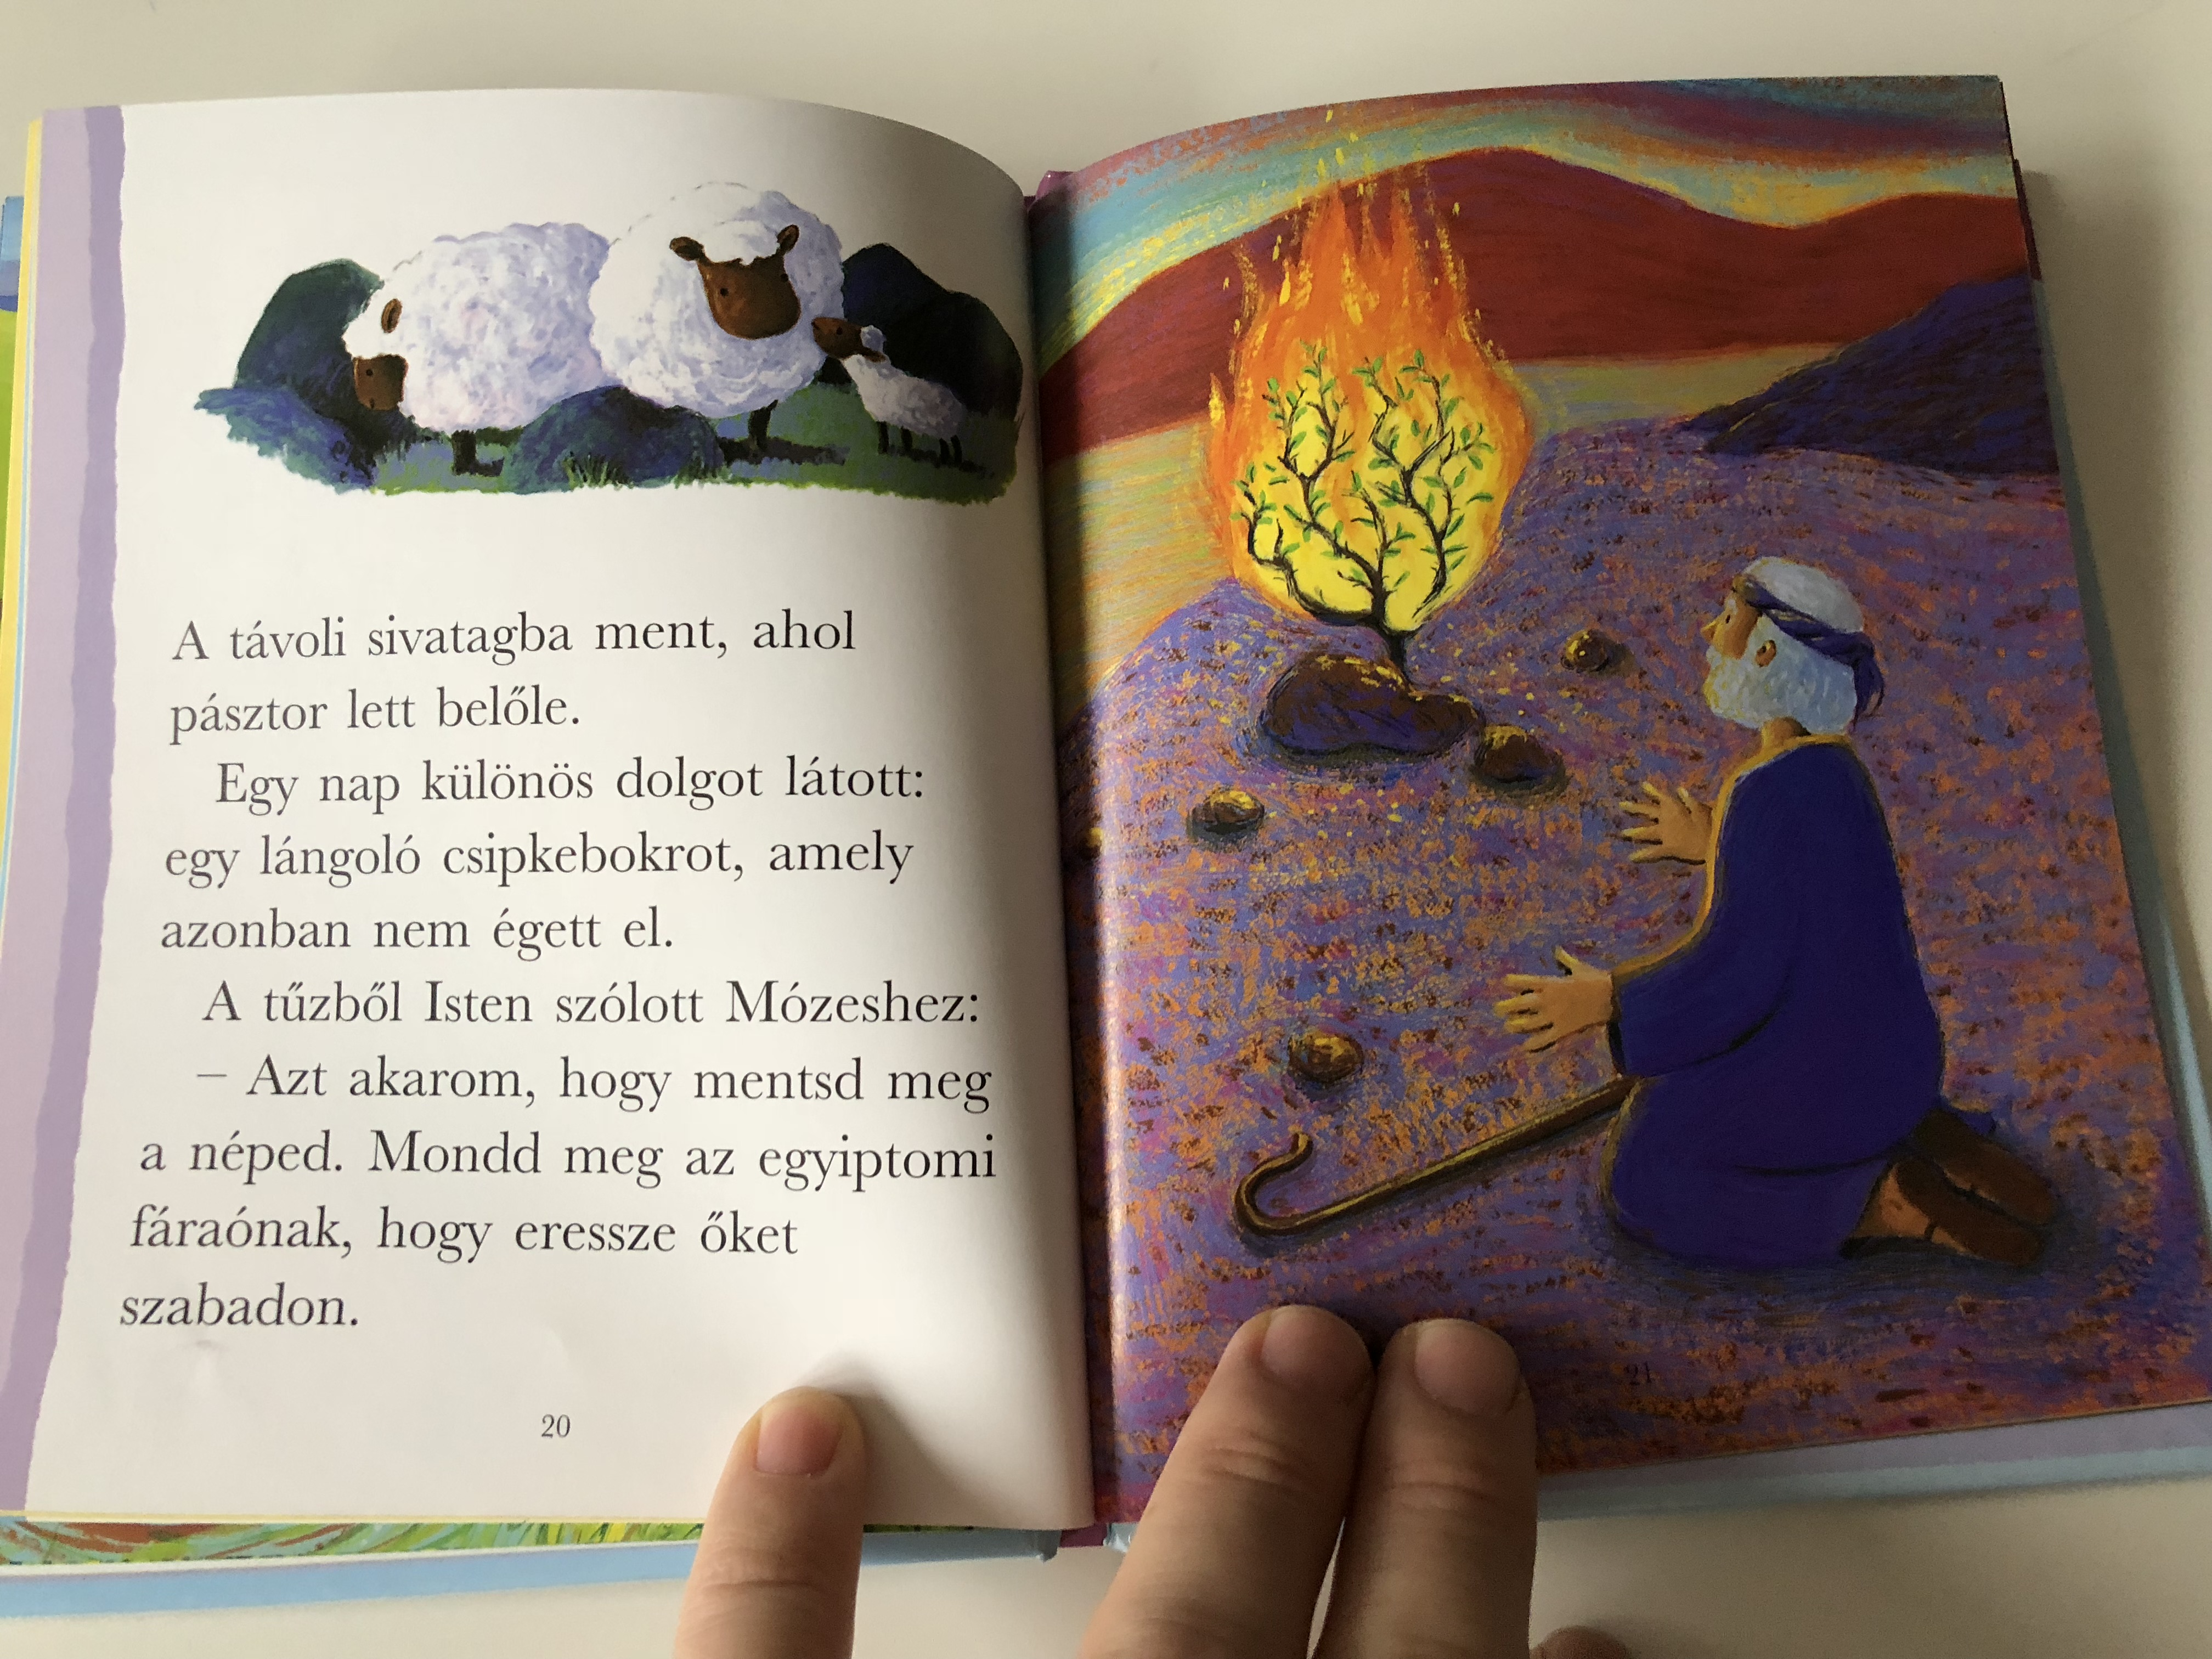 m-zes-moses-and-the-princess-in-hungarian-language-lion-hudson-sophie-piper-estelle-corke-hardcover-t-rt-netek-bibliai-id-kb-l-besz-l-hal-kft-9-.jpg